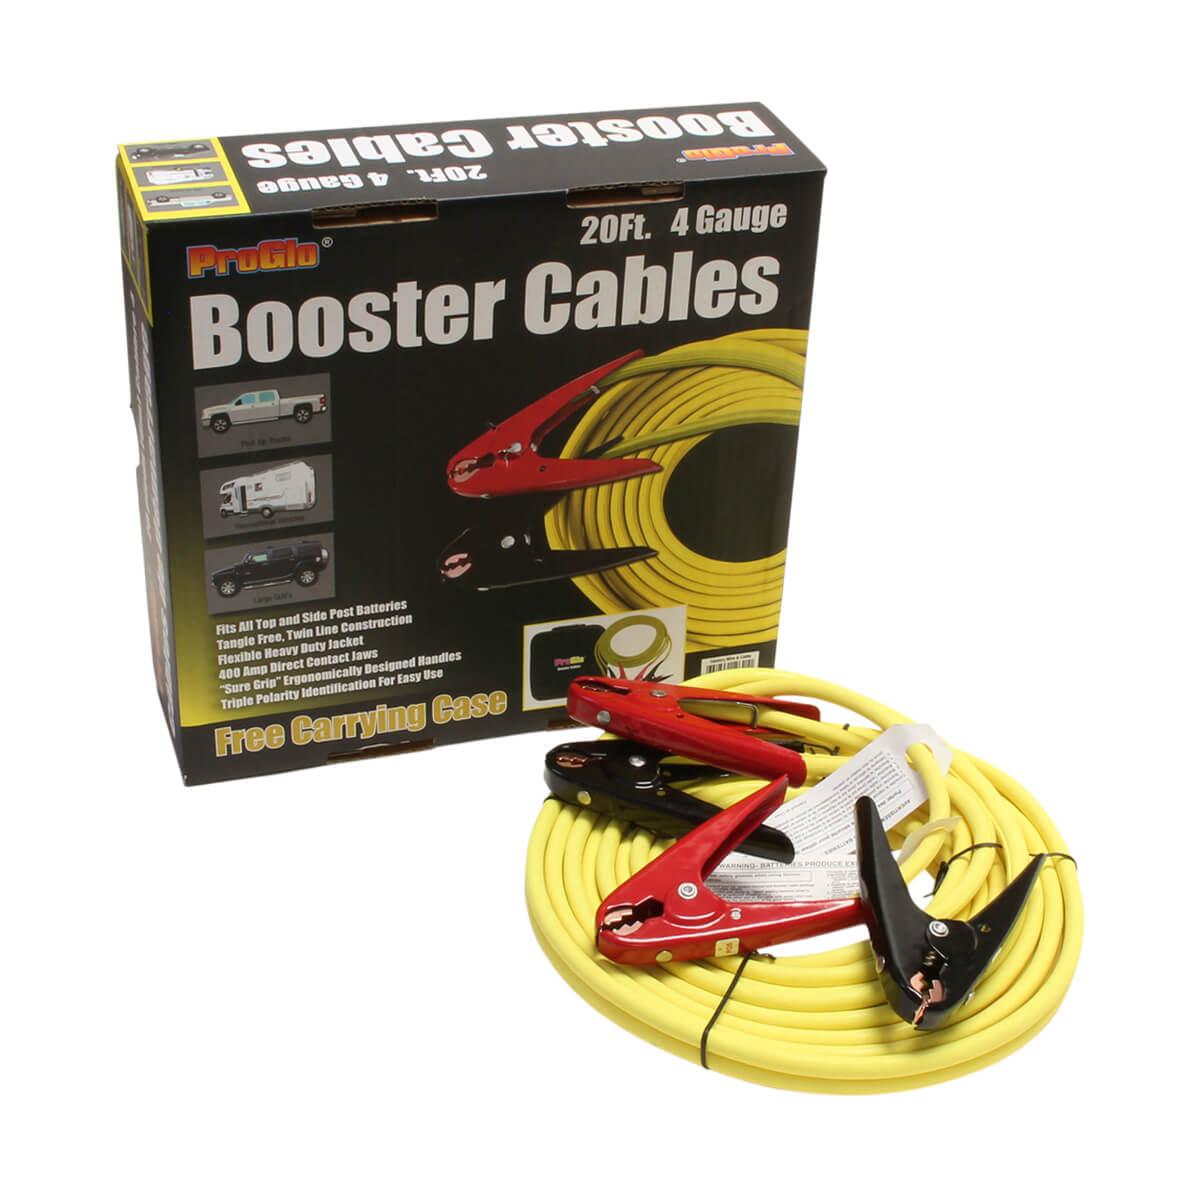 20' Pro Glo® Booster Cables, 4 Ga. w/Case